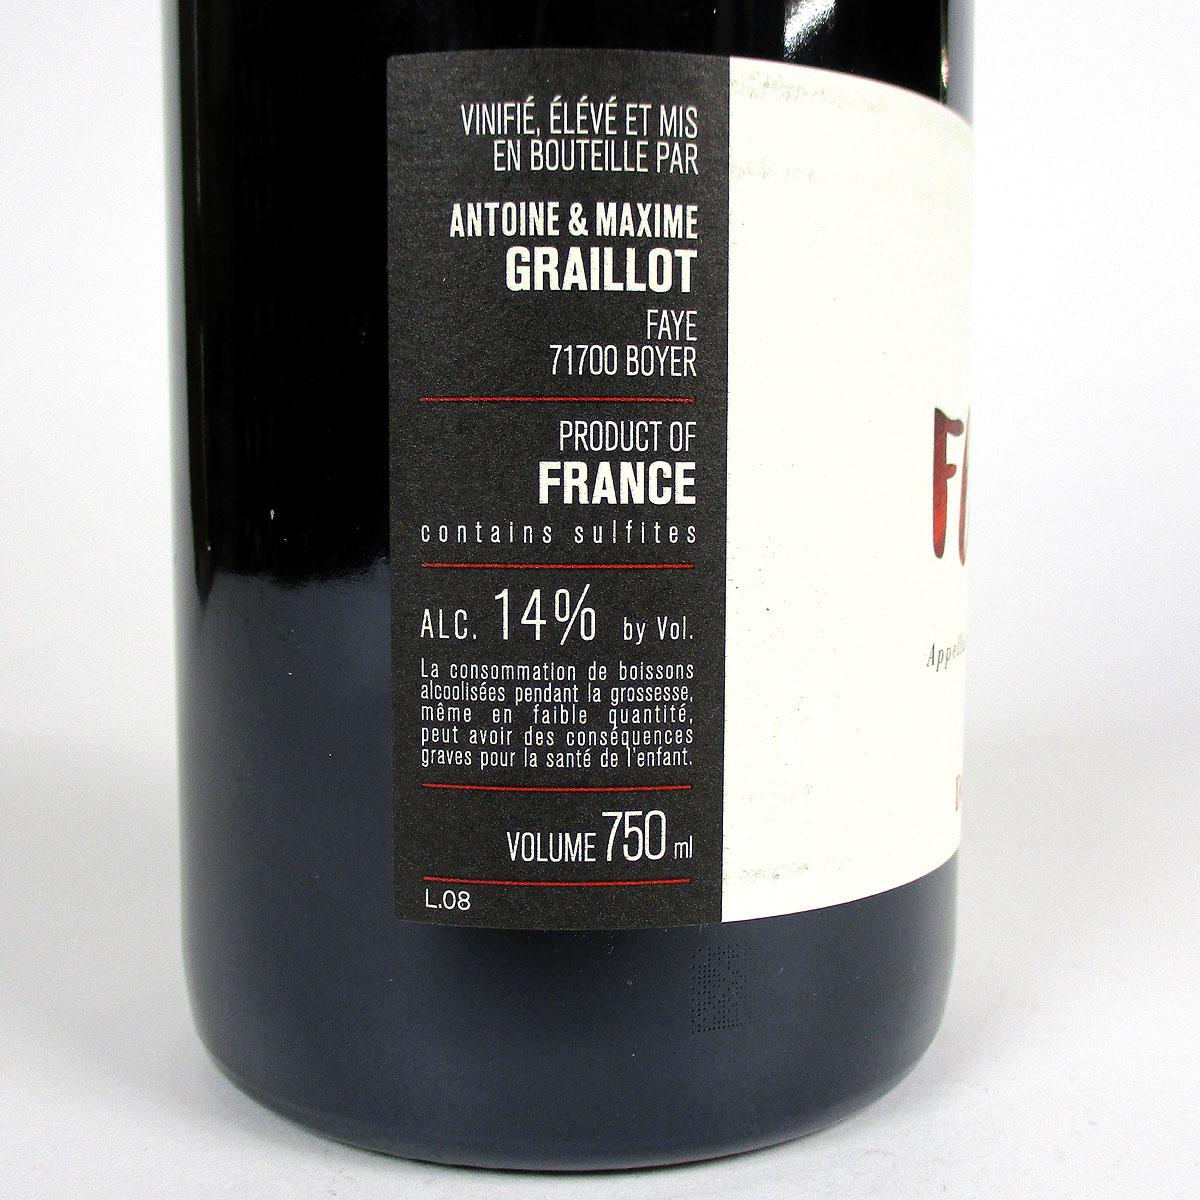 AOC Fleurie: Domaine de Fa 2018 - Bottle Side Label